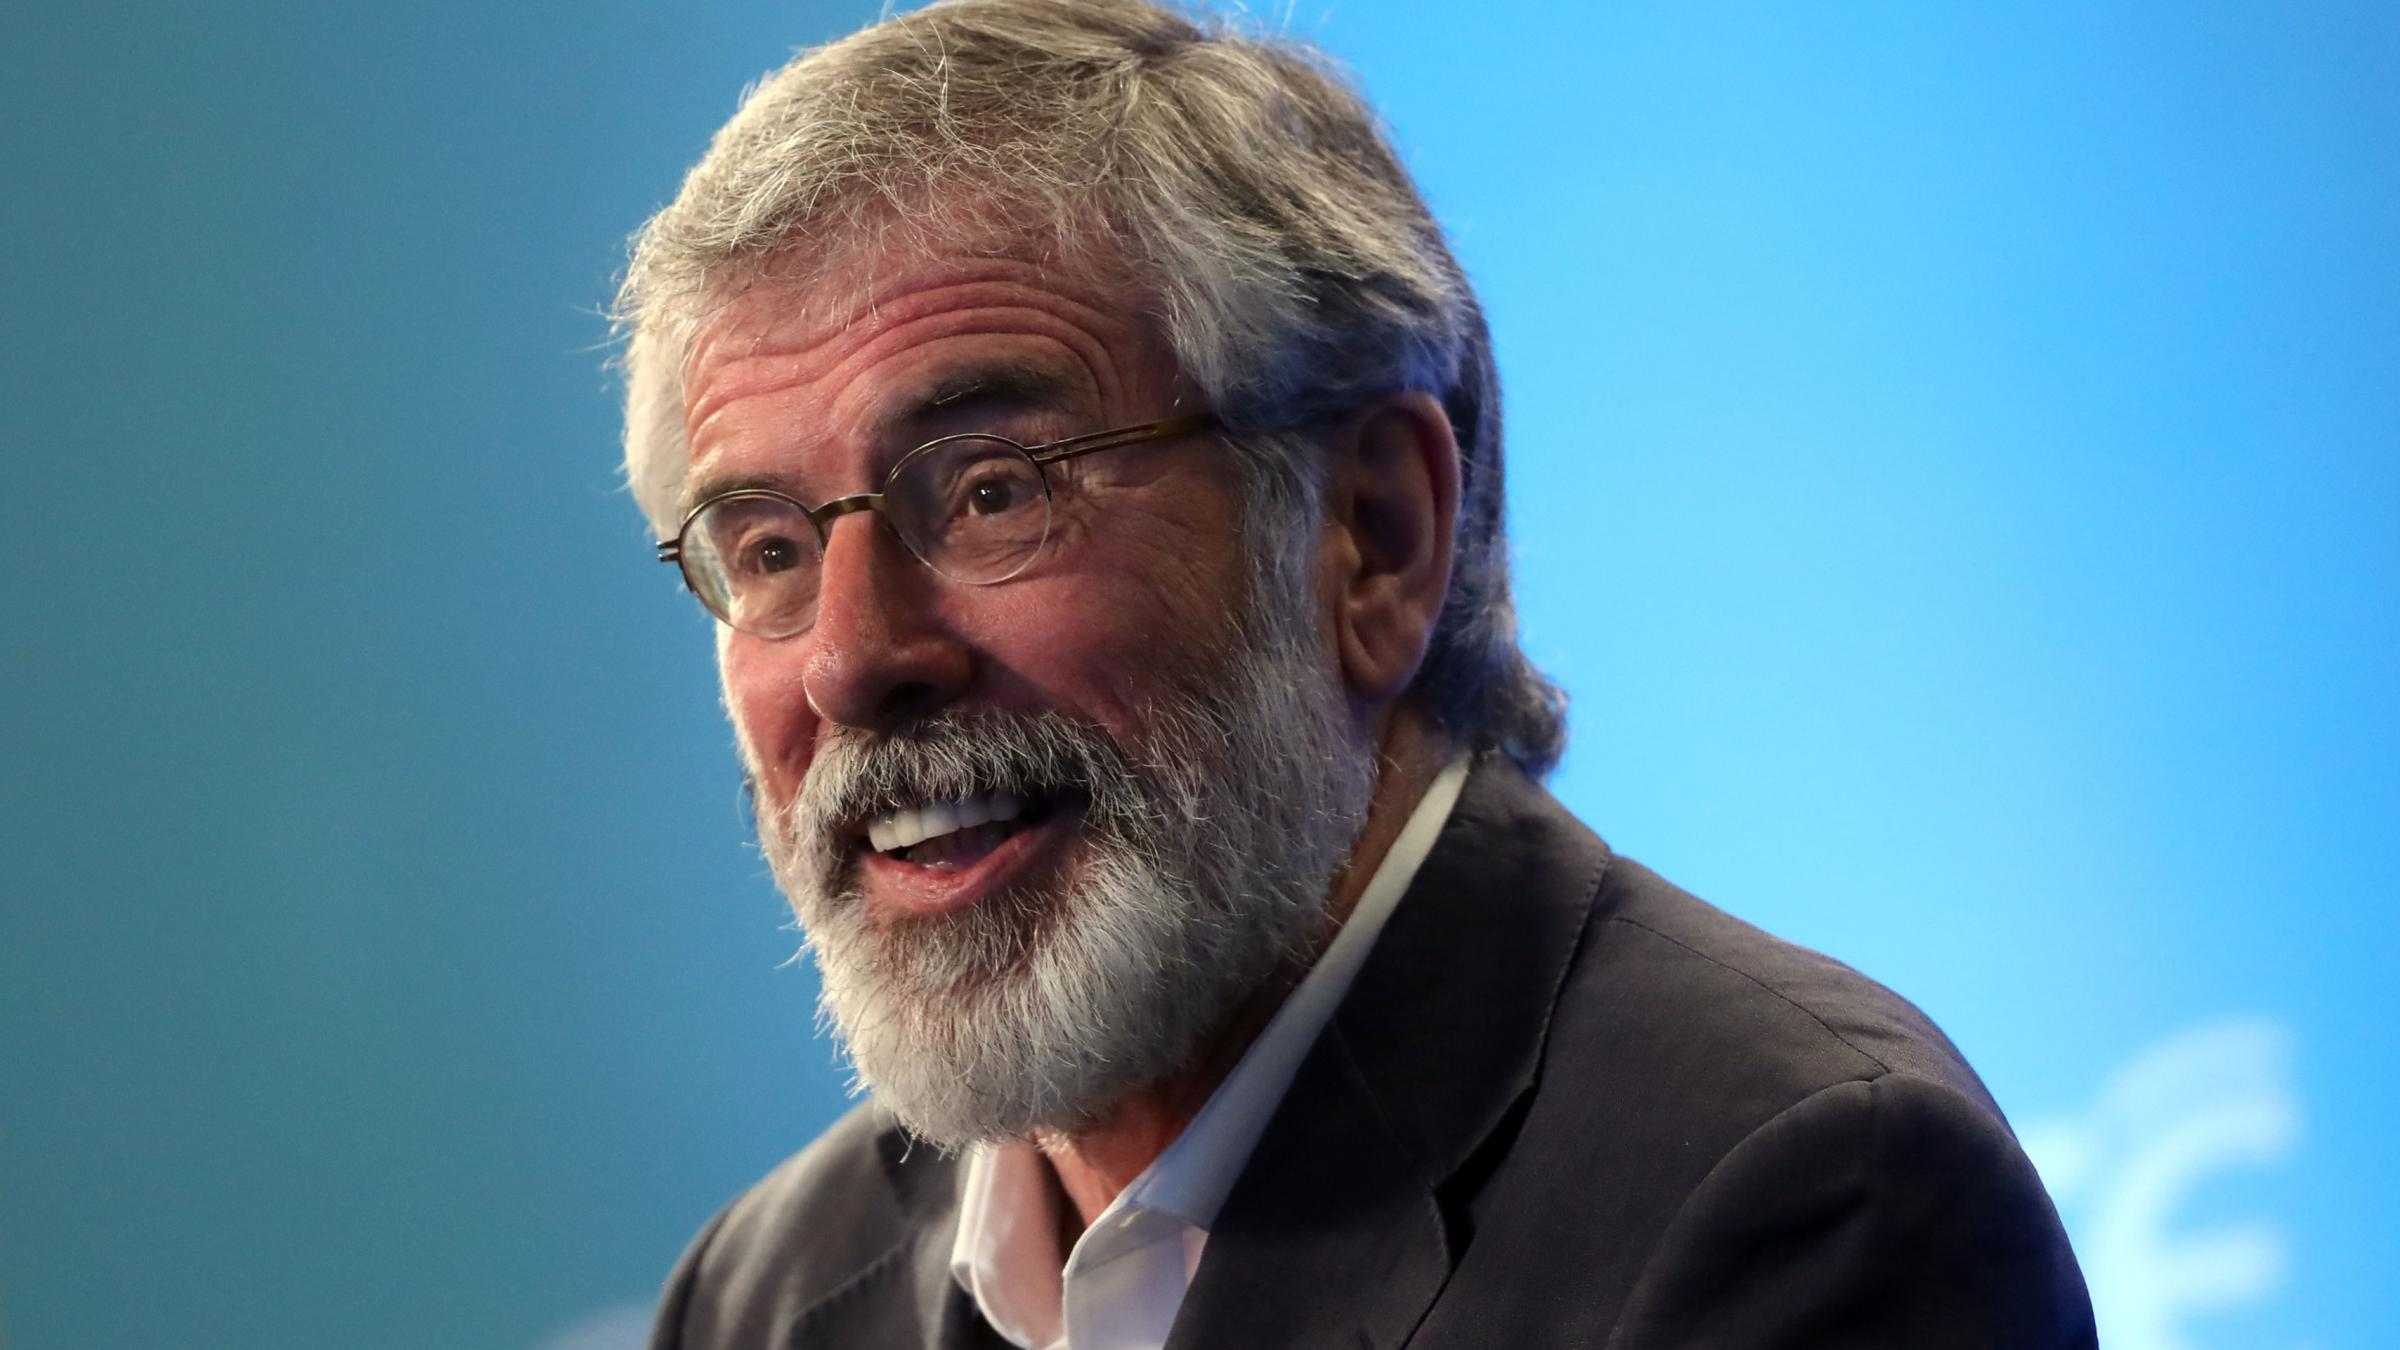 'Anxiety and fear' over Tory-DUP deal: Sinn Fein